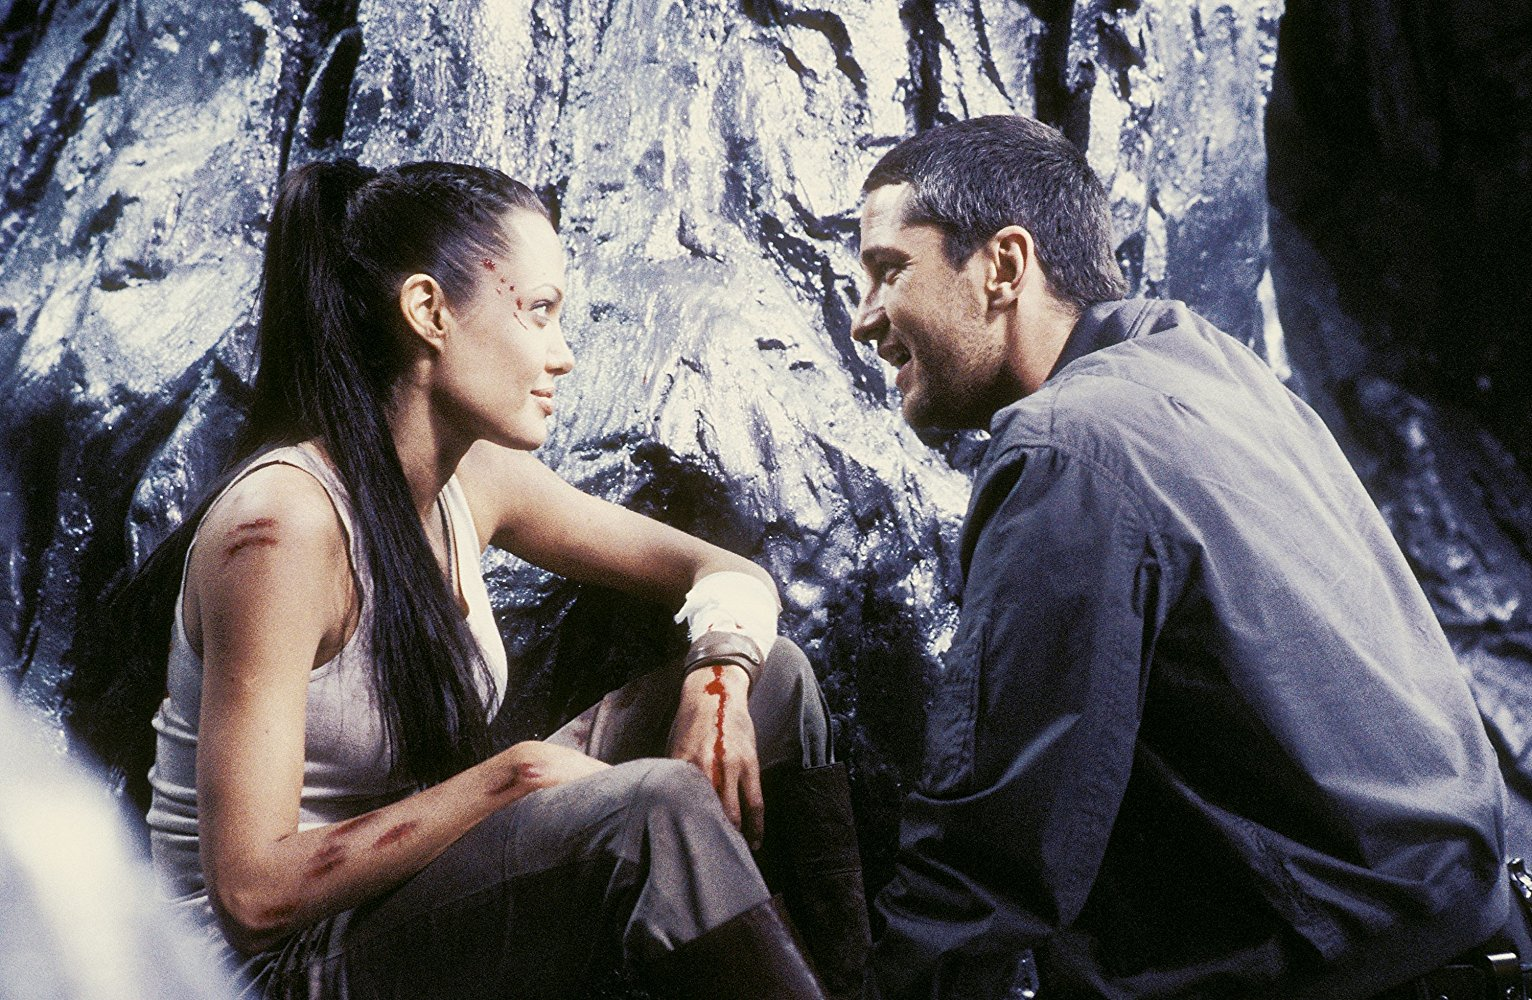 Angelina Jolie, Gerard Butler in Lara Croft, Tomb Raider: The Cradle of Life (2003)